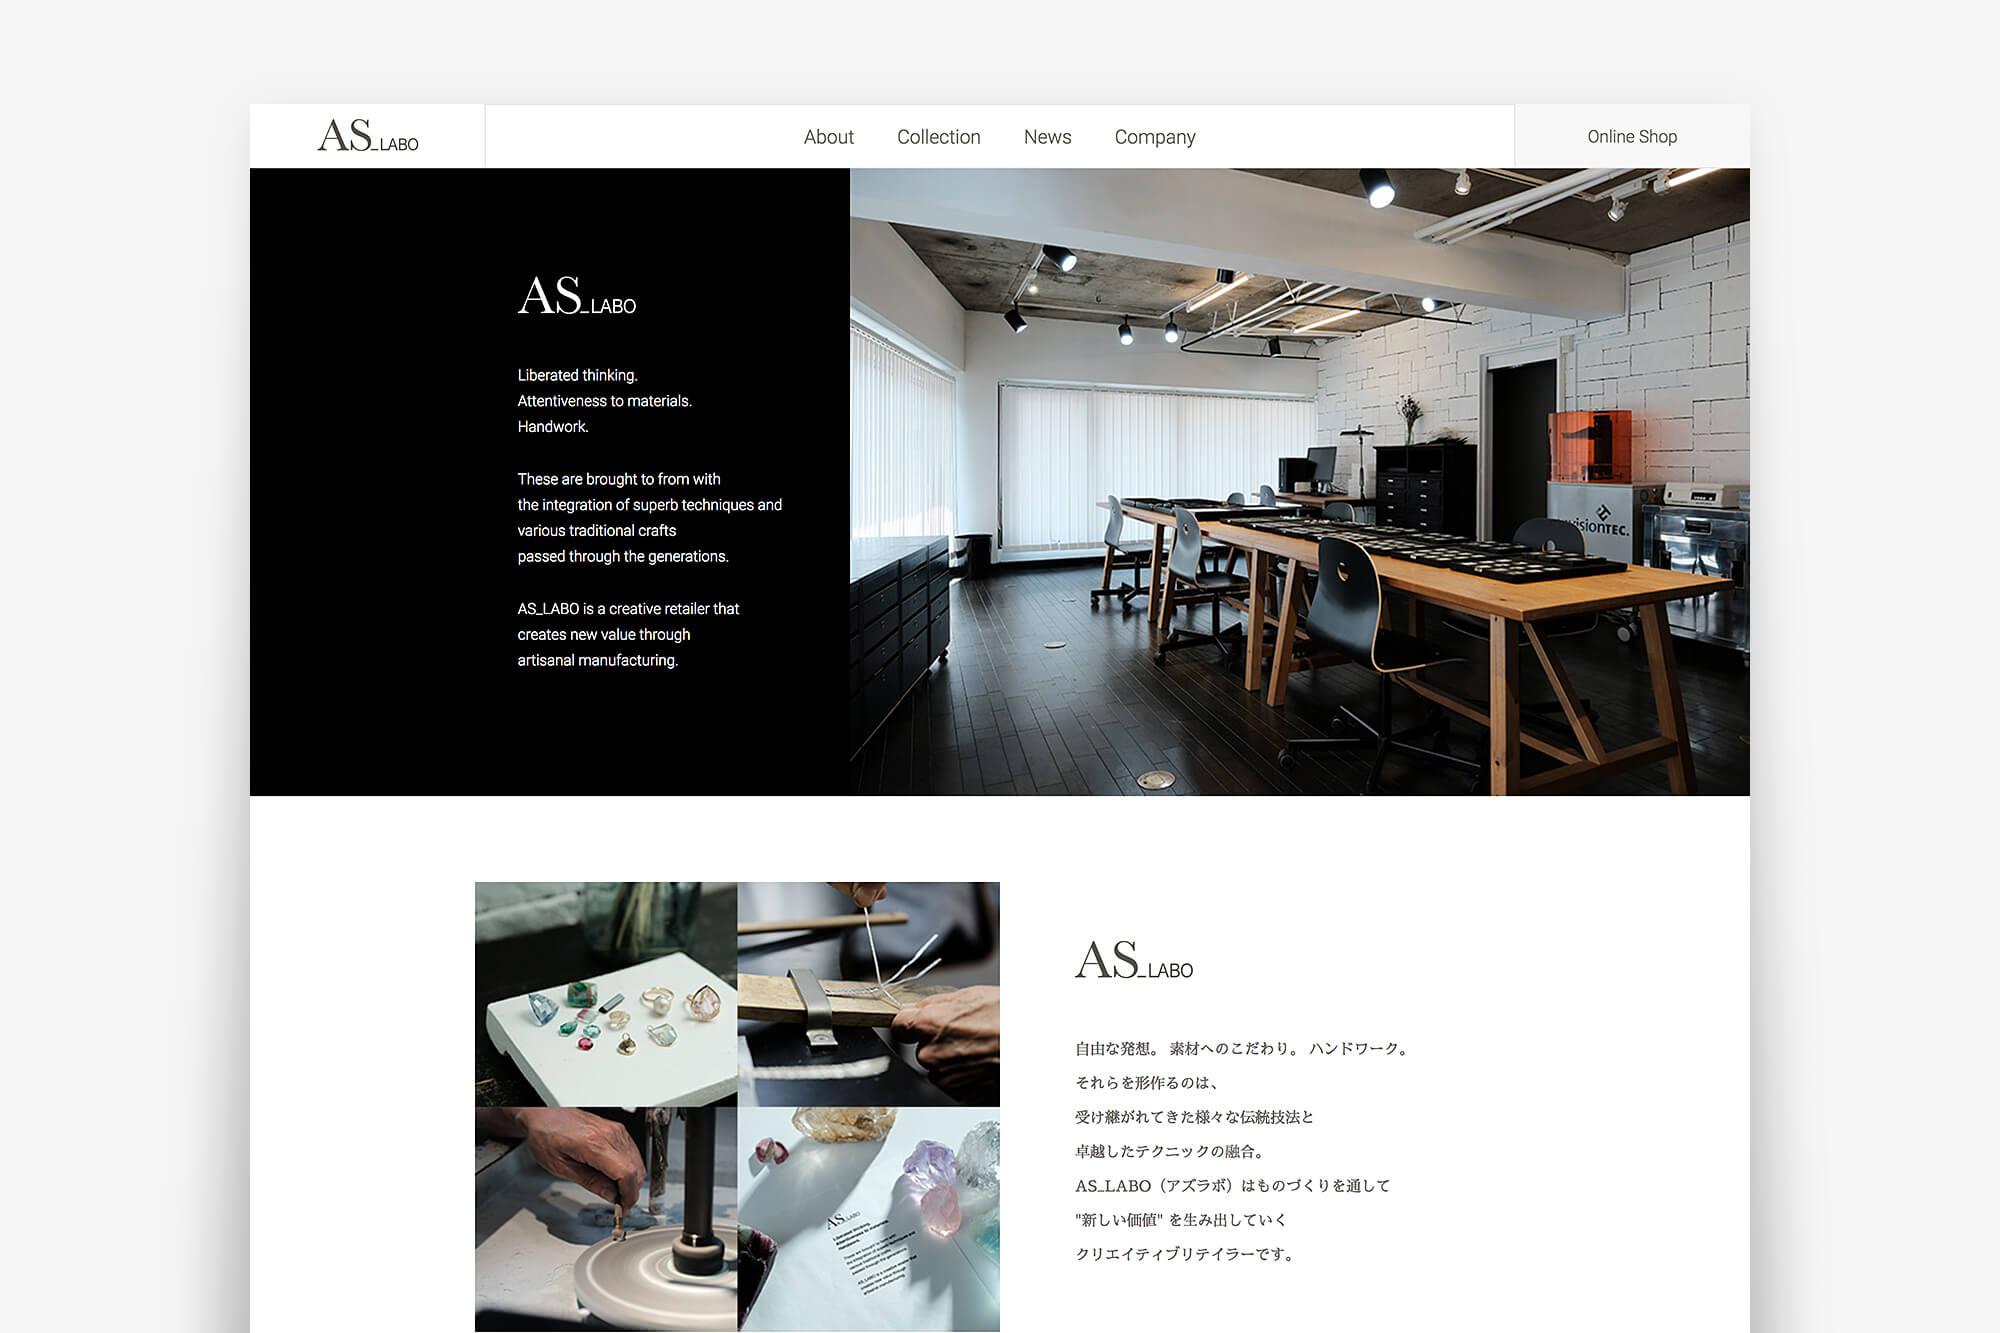 AS_LABO オフィシャルサイト